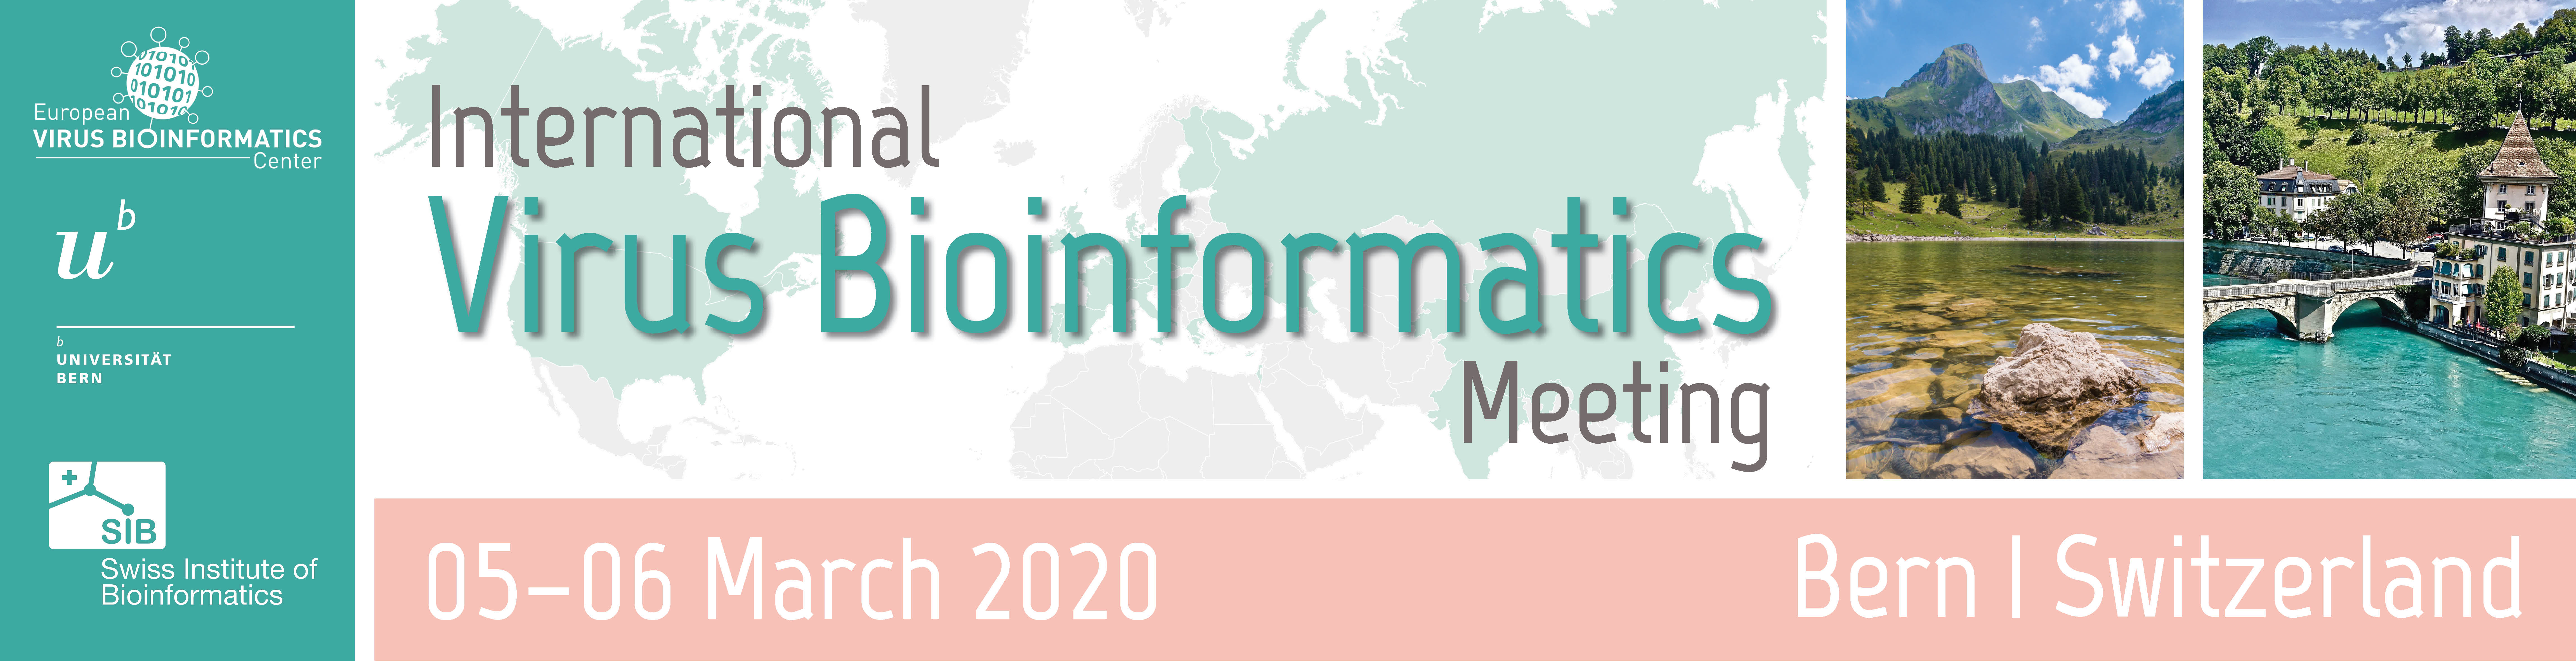 International Virus Bioinformatics Meeting 2020 – Evbc